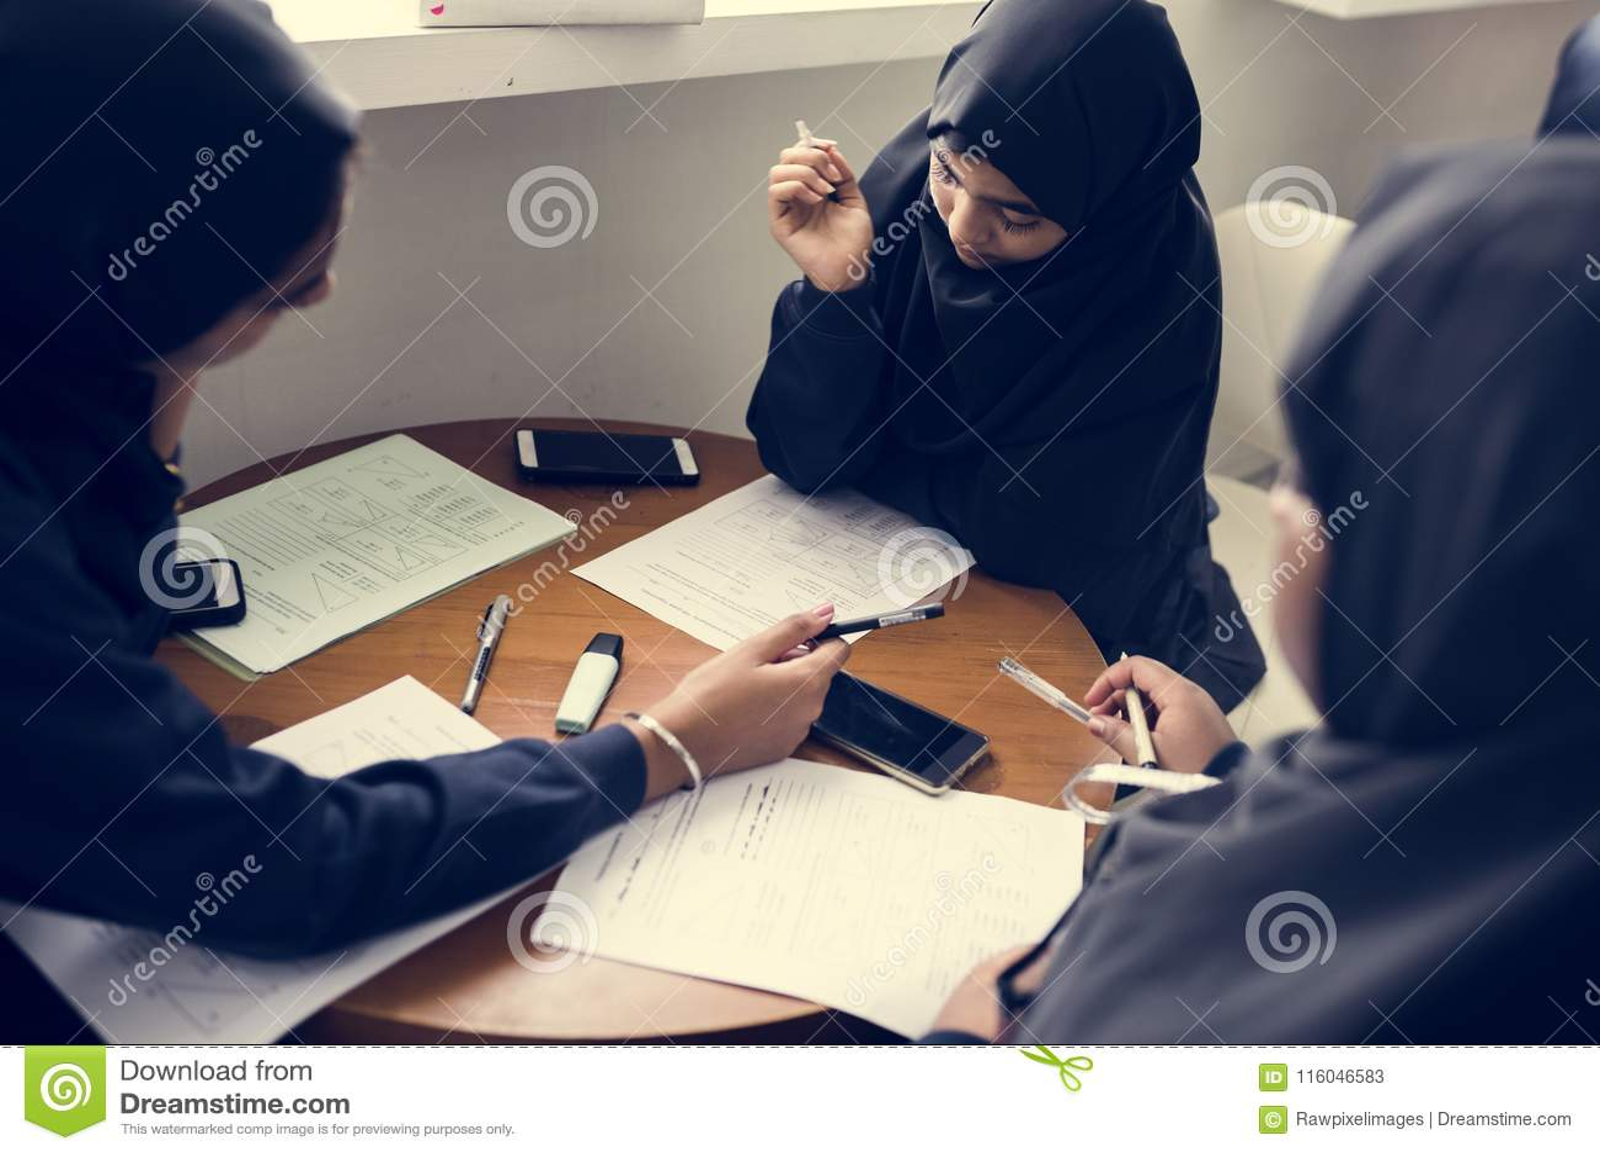 dubai muslim girls